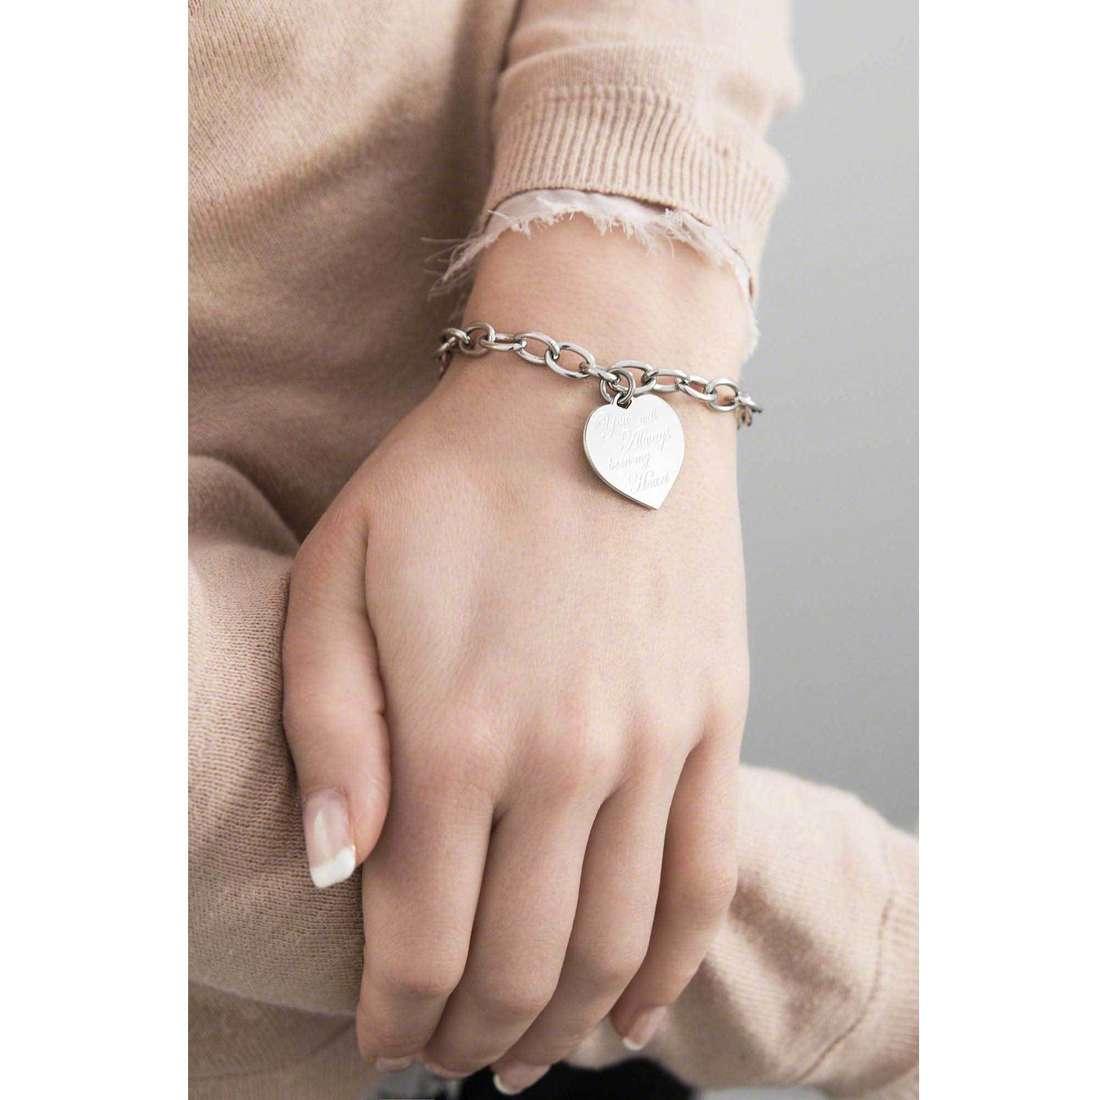 Nomination bracelets Sweetheart femme 026112/014 indosso